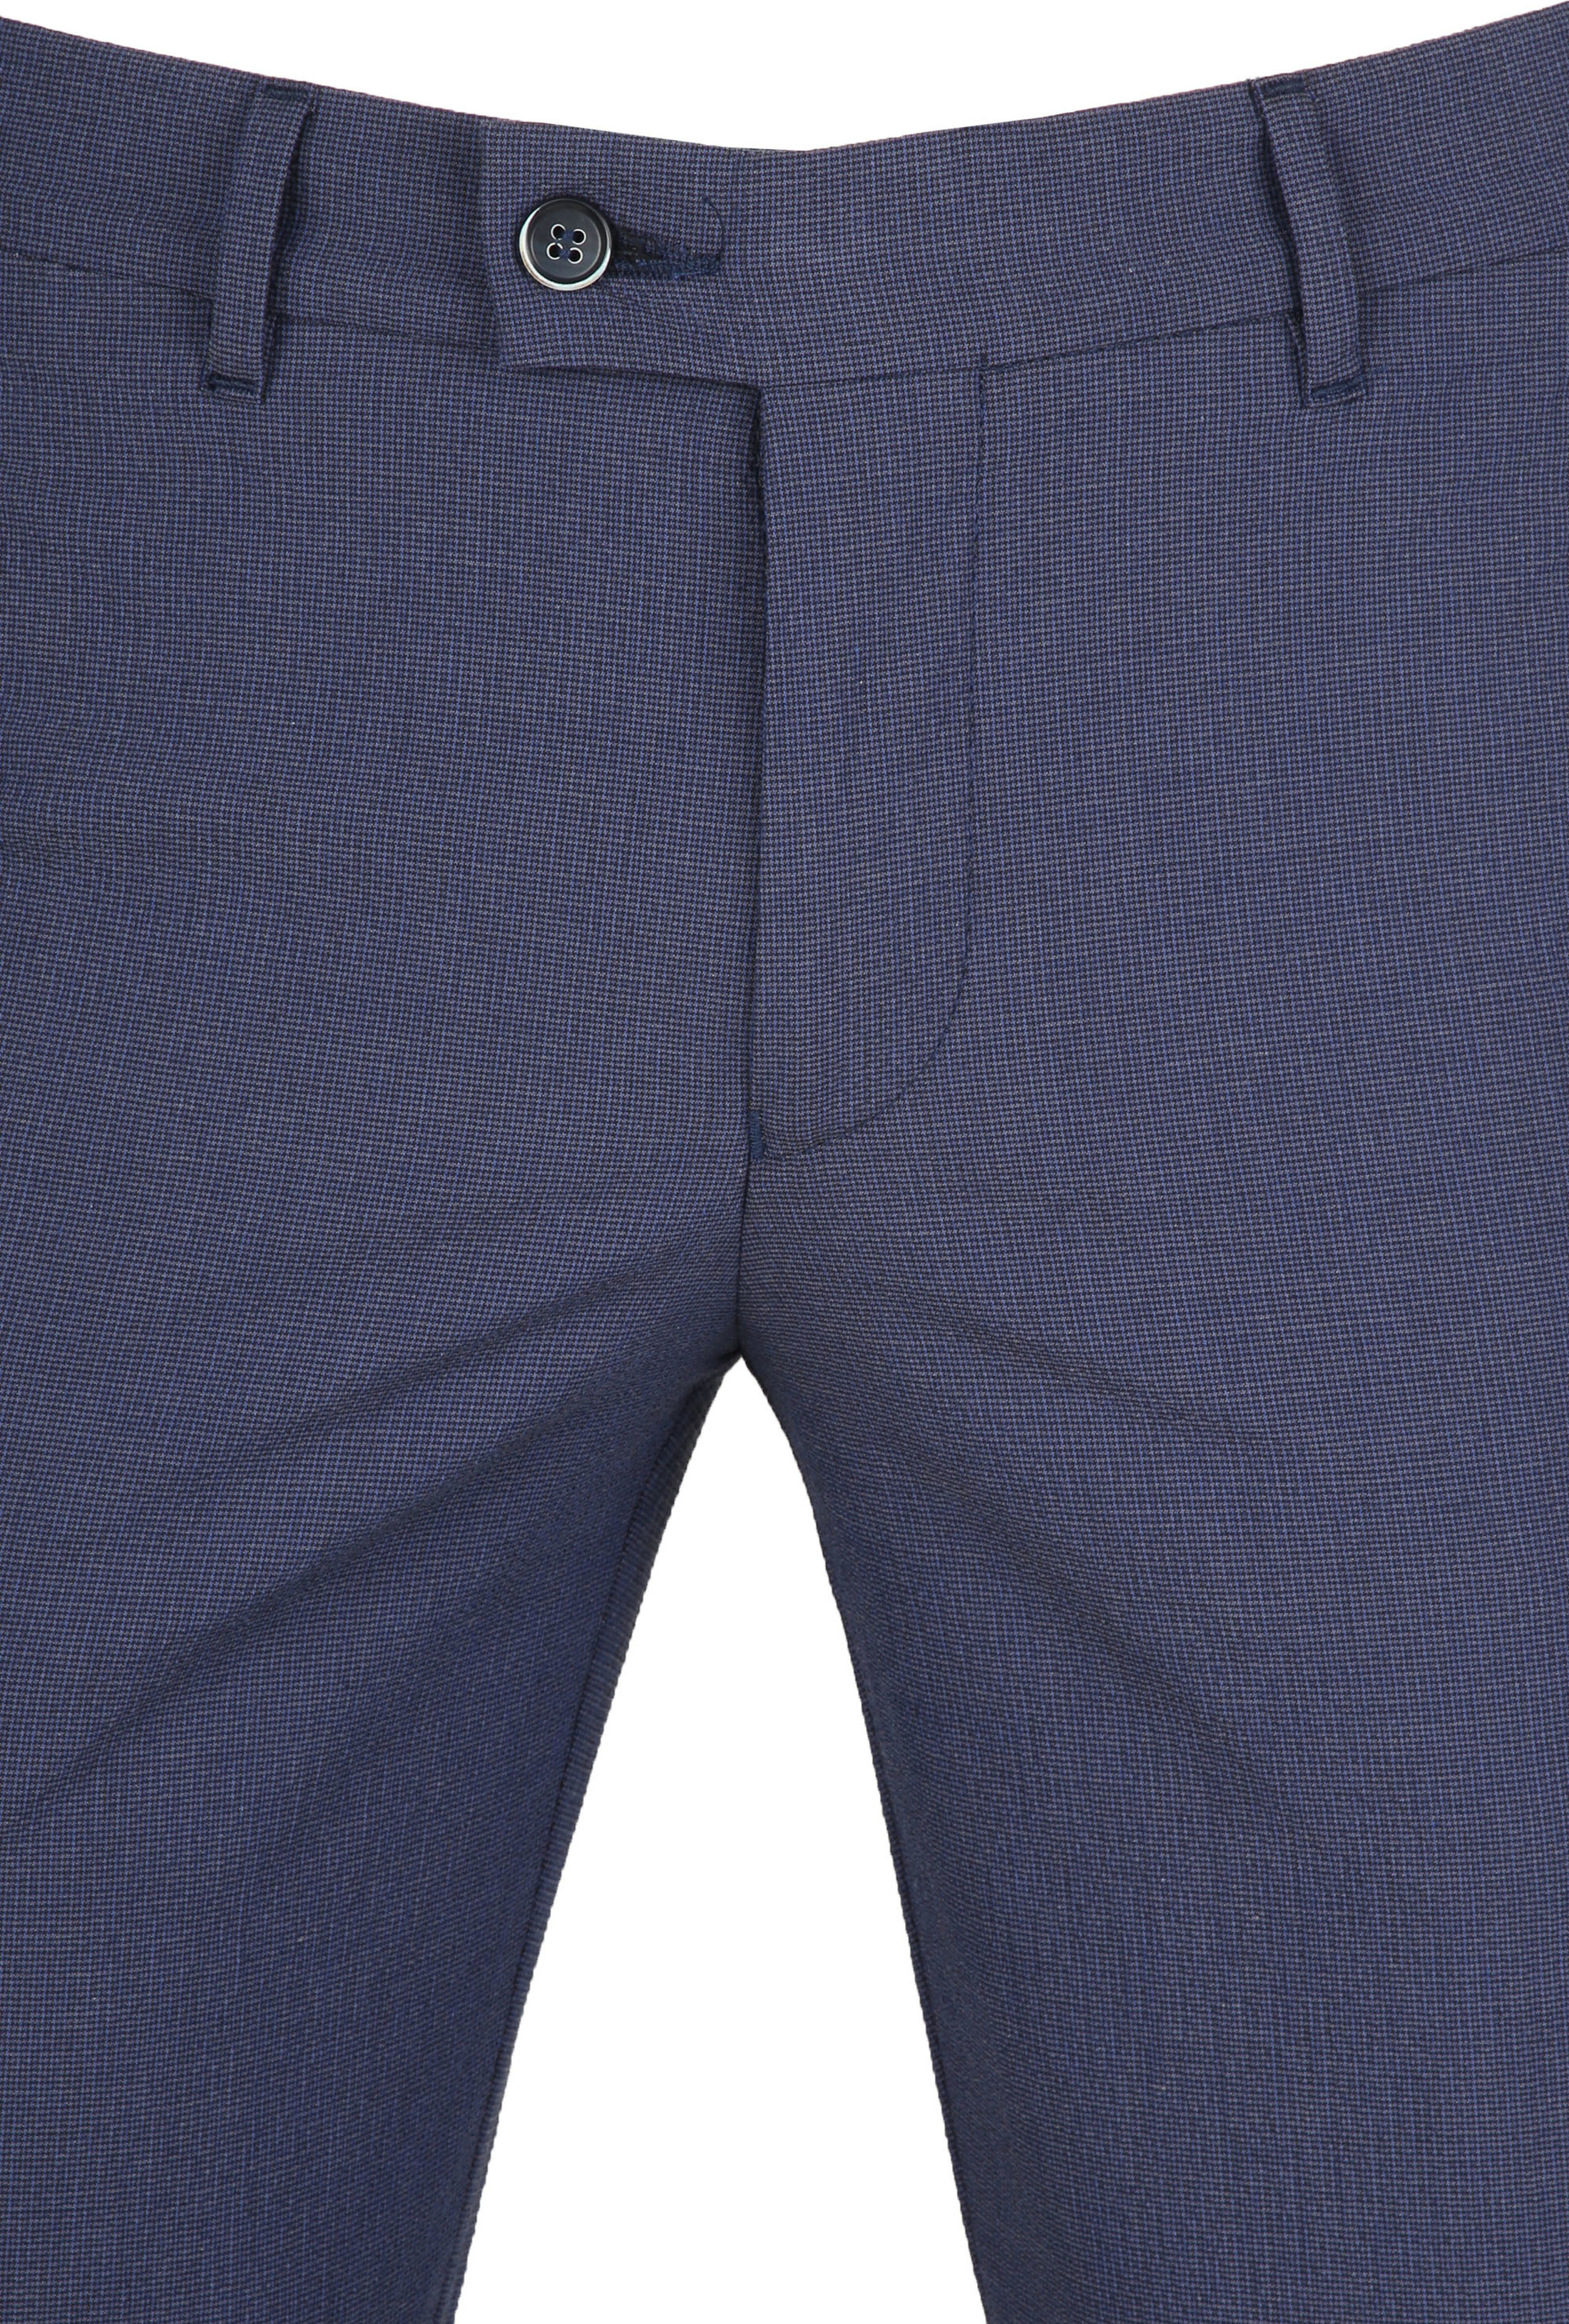 Suitable Pantalon Pisa Dessin Blau foto 2